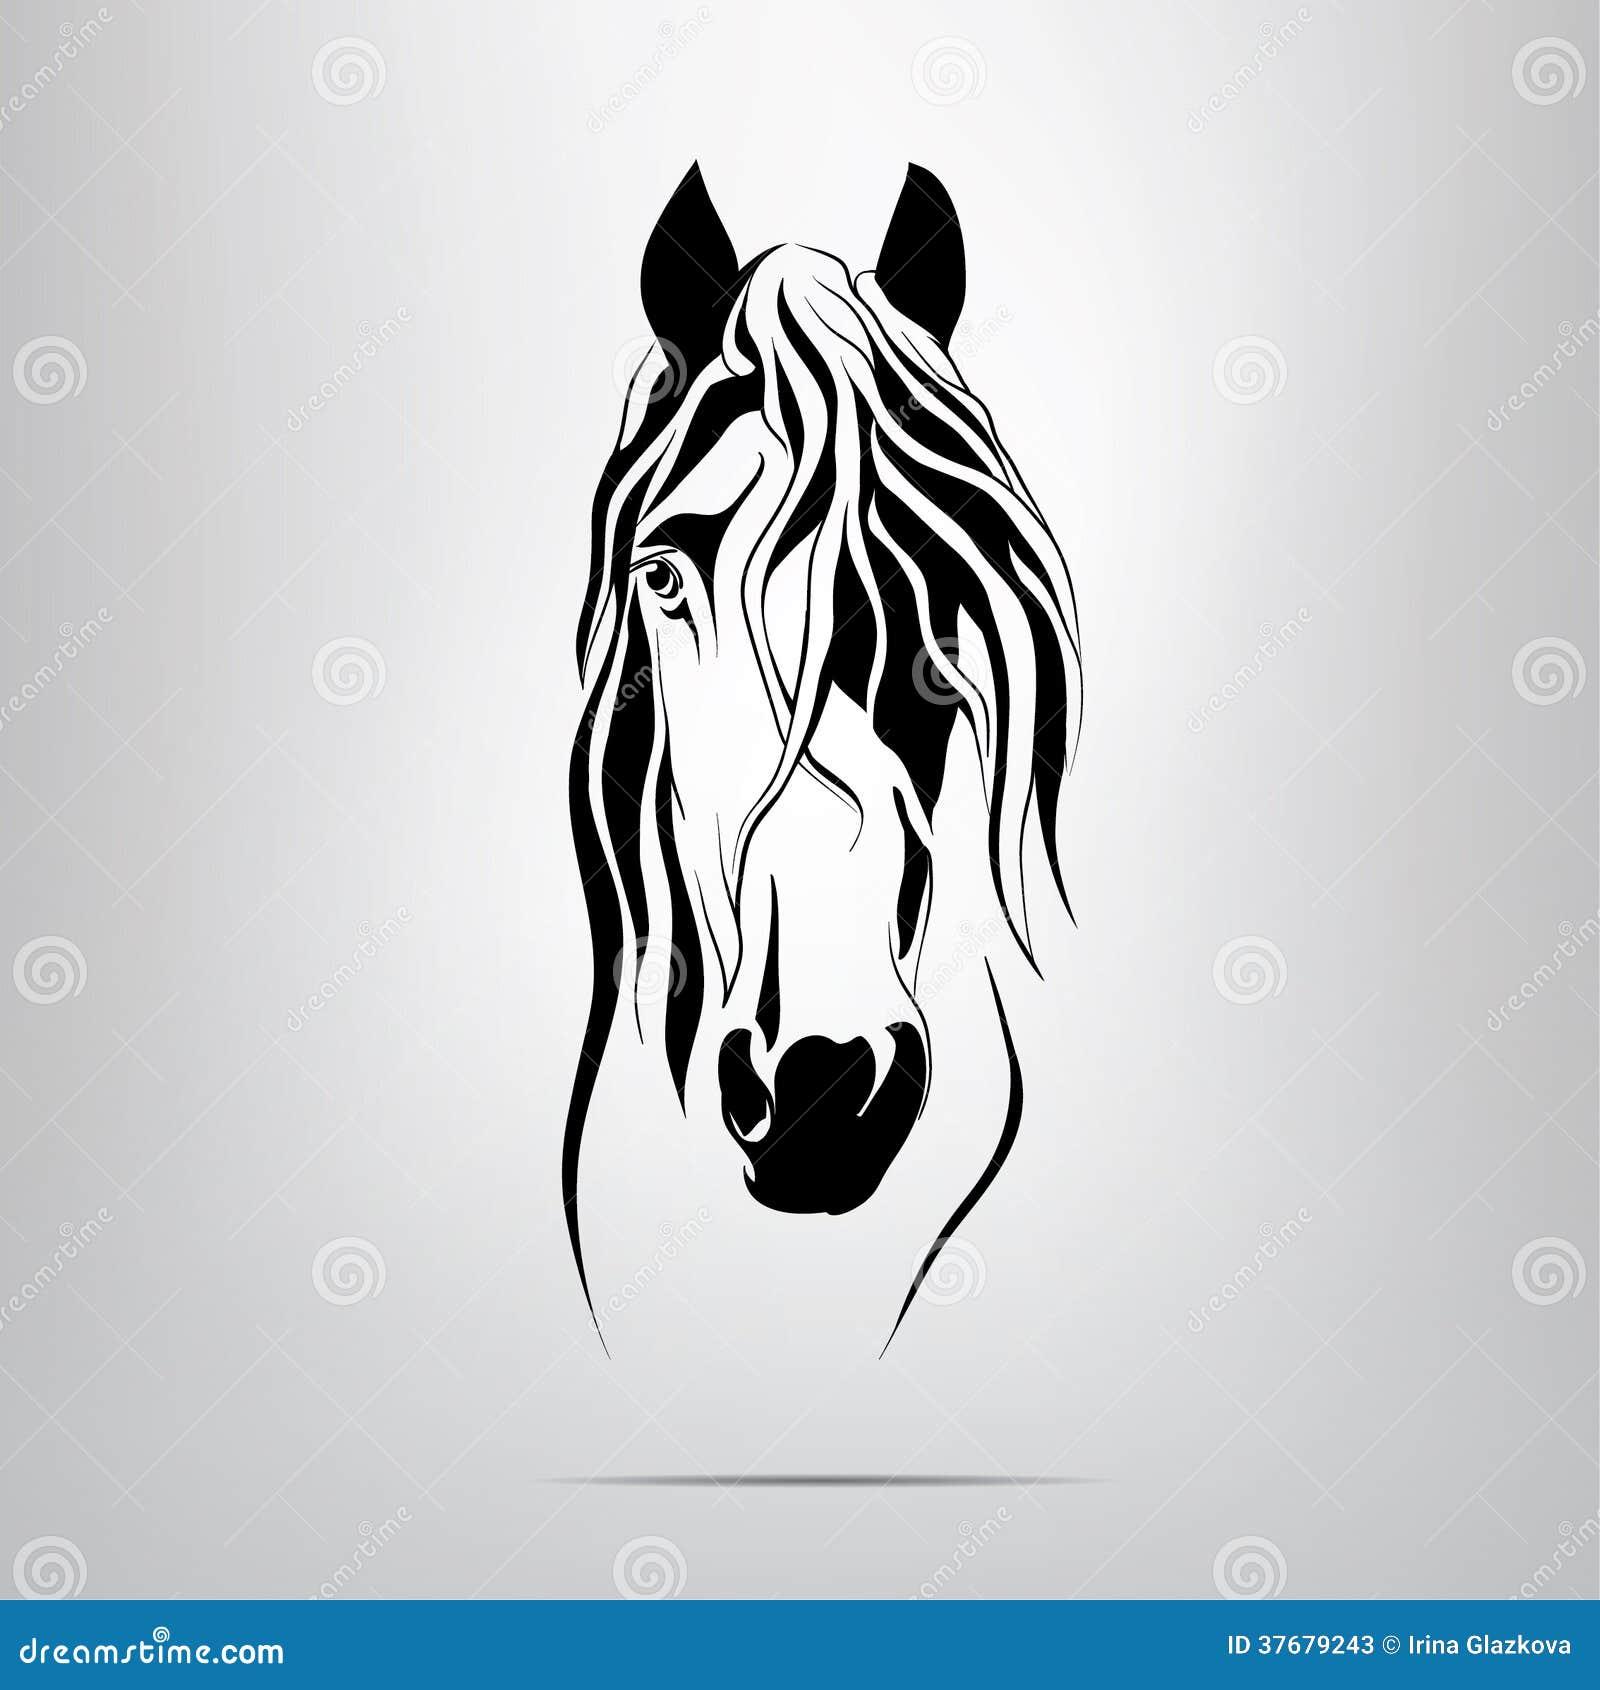 Vector Silhouette Of A Horse's Head Stock Photos - Image: 37679243